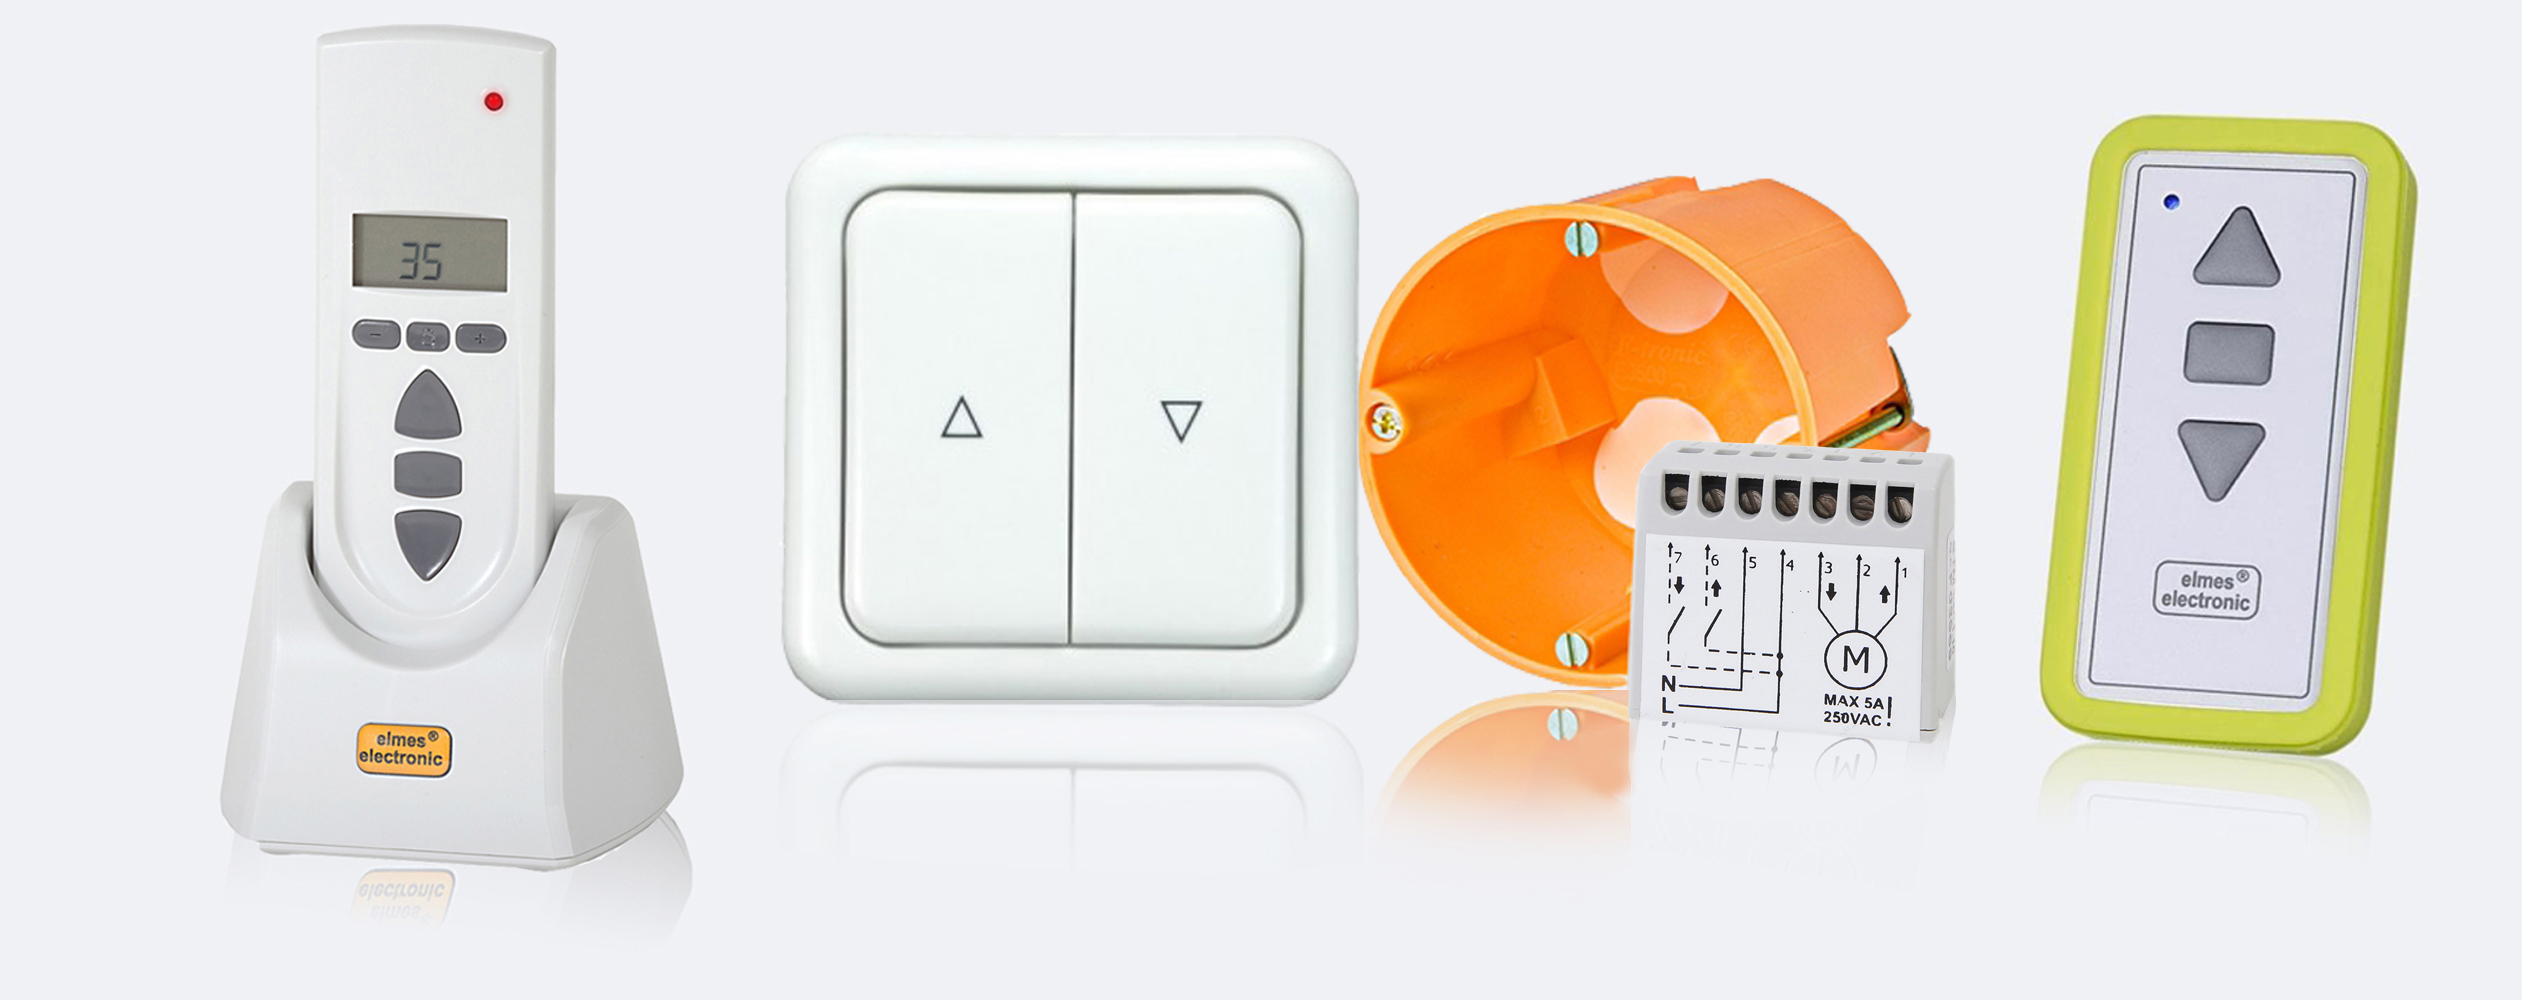 Zestaw STX, STM, CH3NT  - proste sterowanie systemem rolet